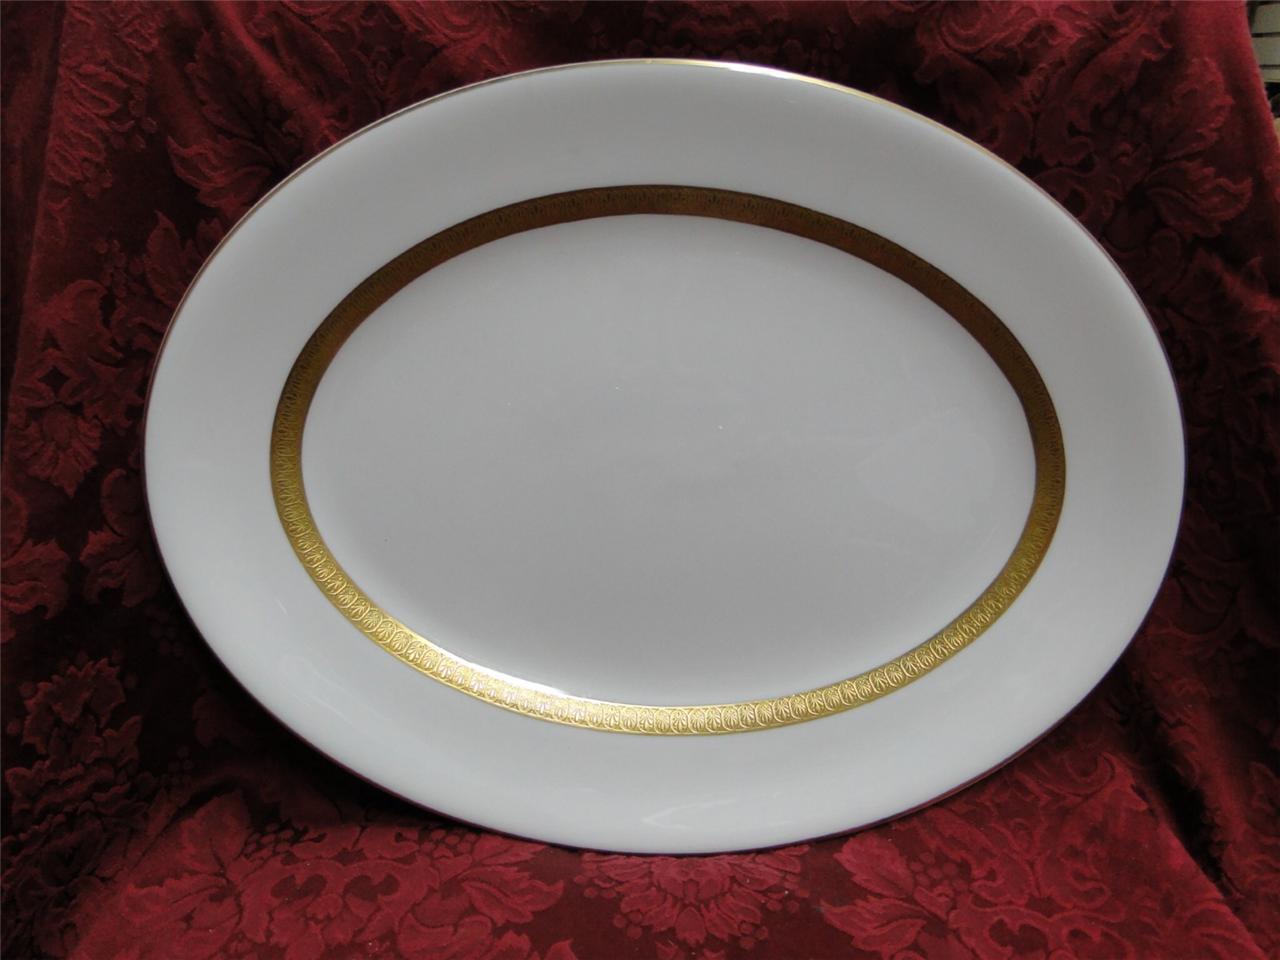 Wedgwood Adelphi, blanc w  or Encrusted Verge  Platter, 16